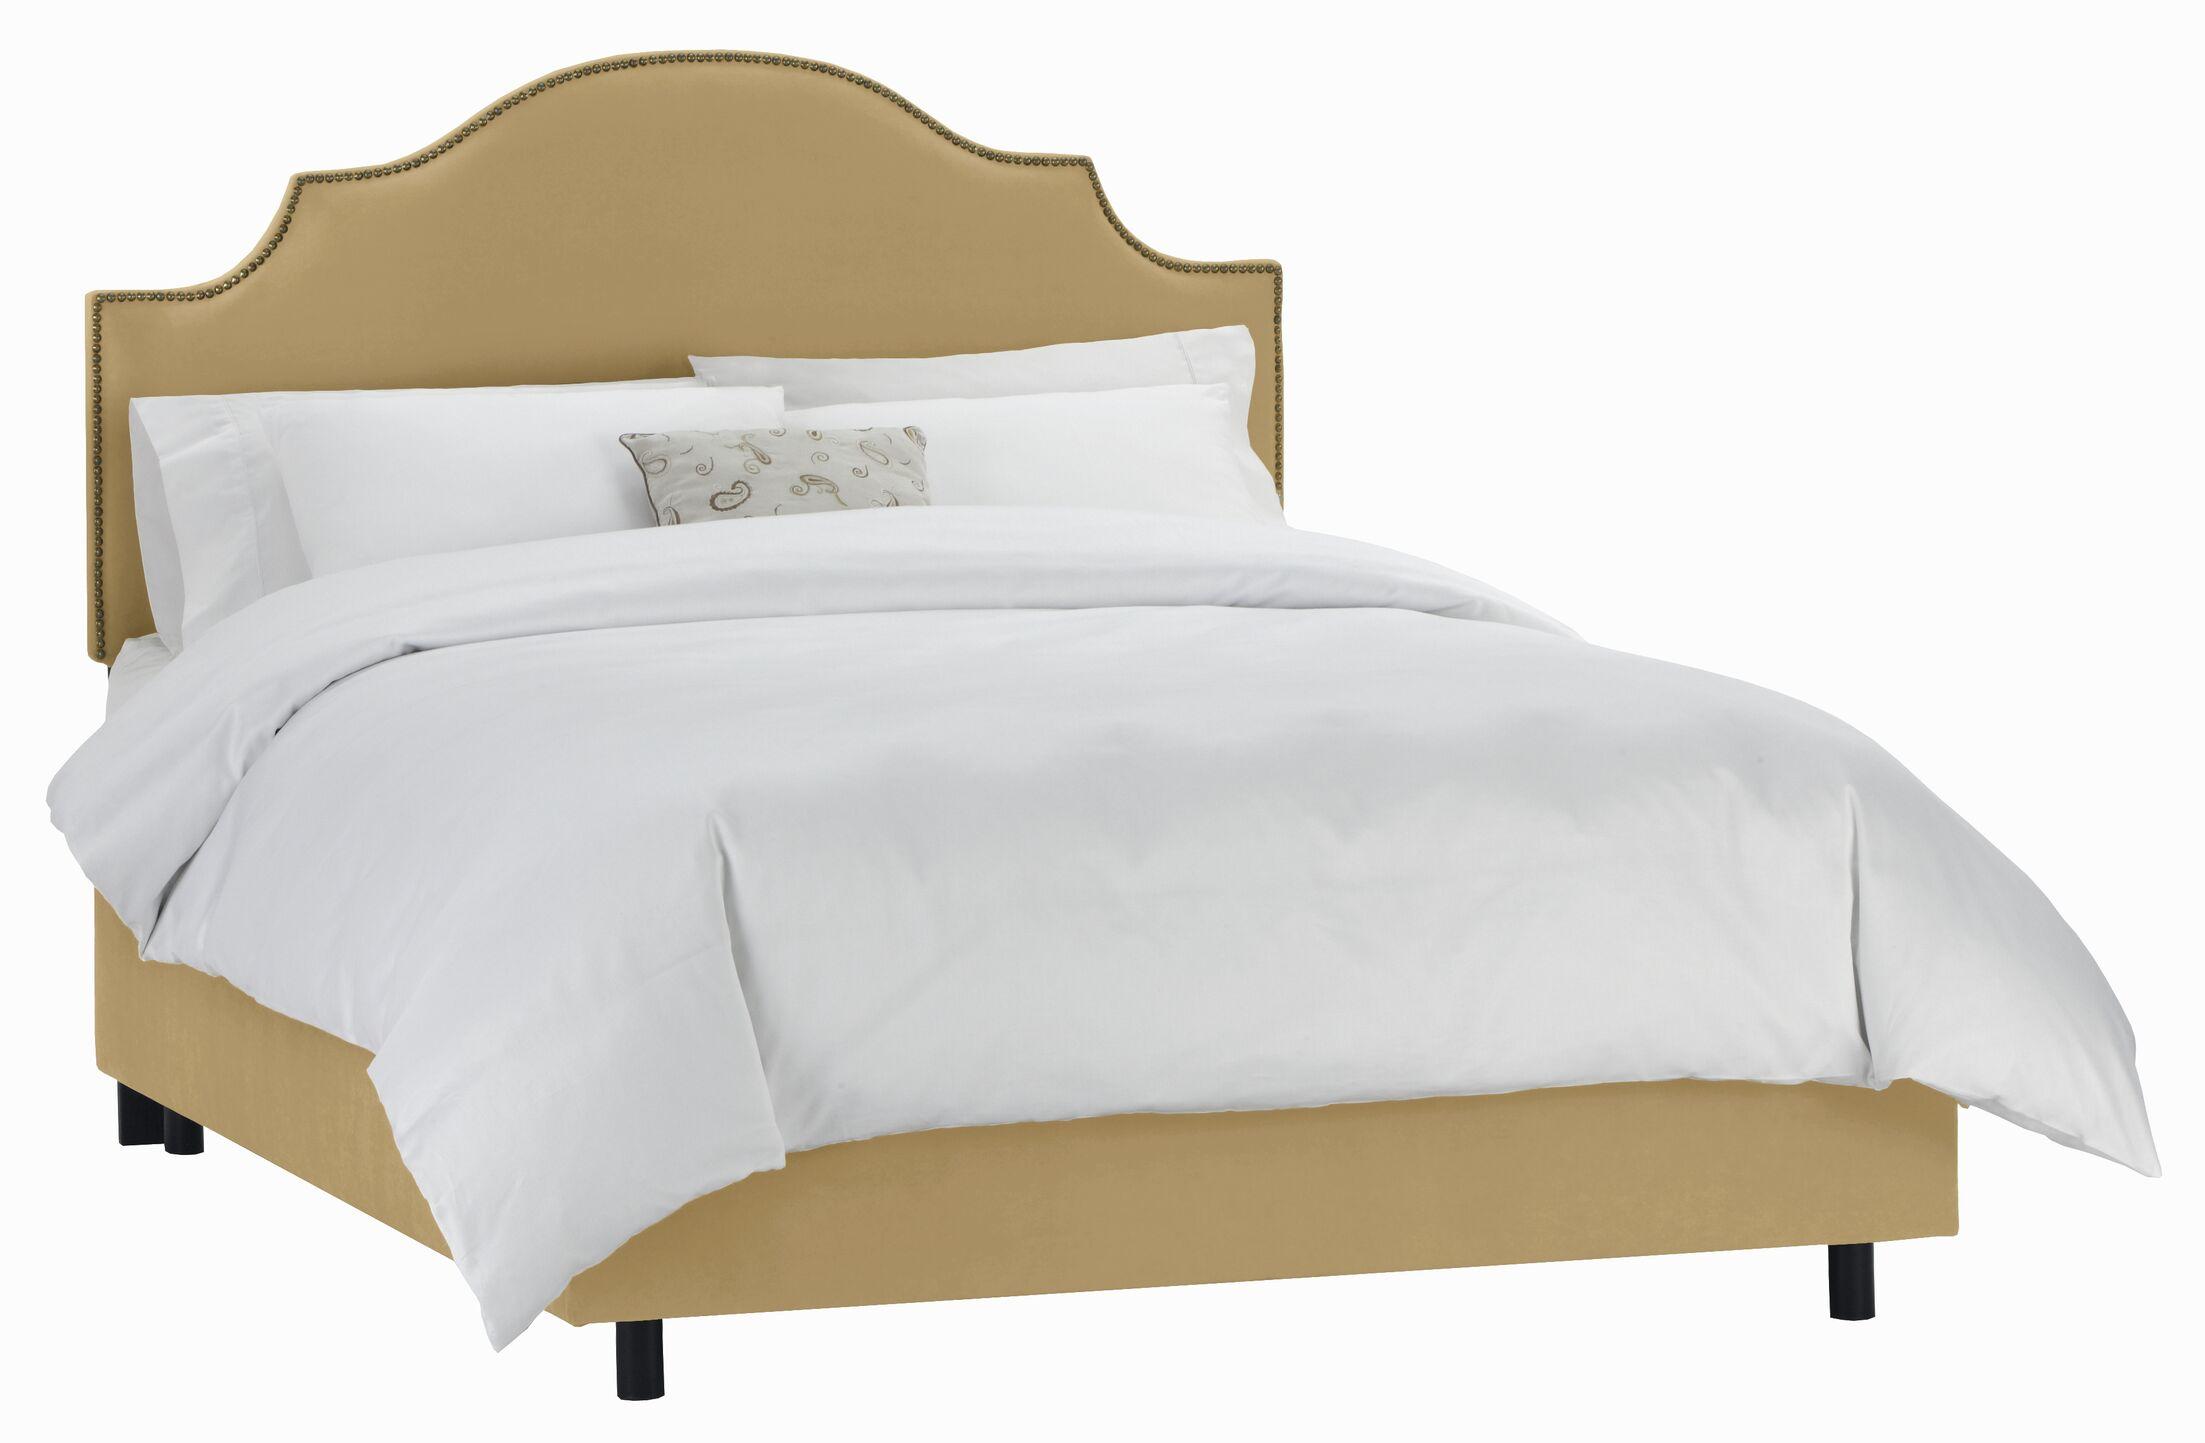 Revley Upholstered Panel Bed Size: California King, Color: Honey